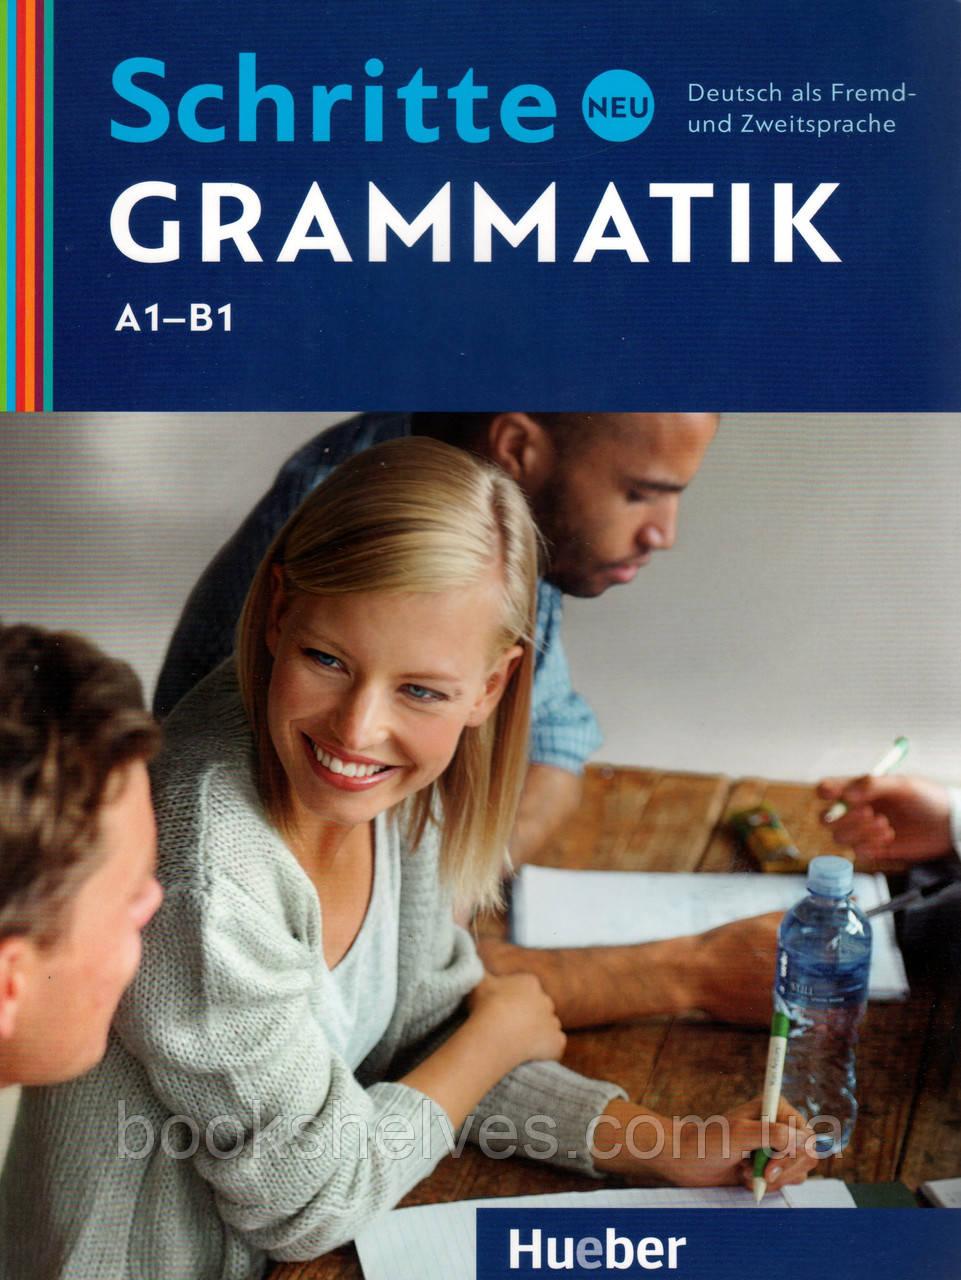 Граматика німецької Schritte Neu Grammatik